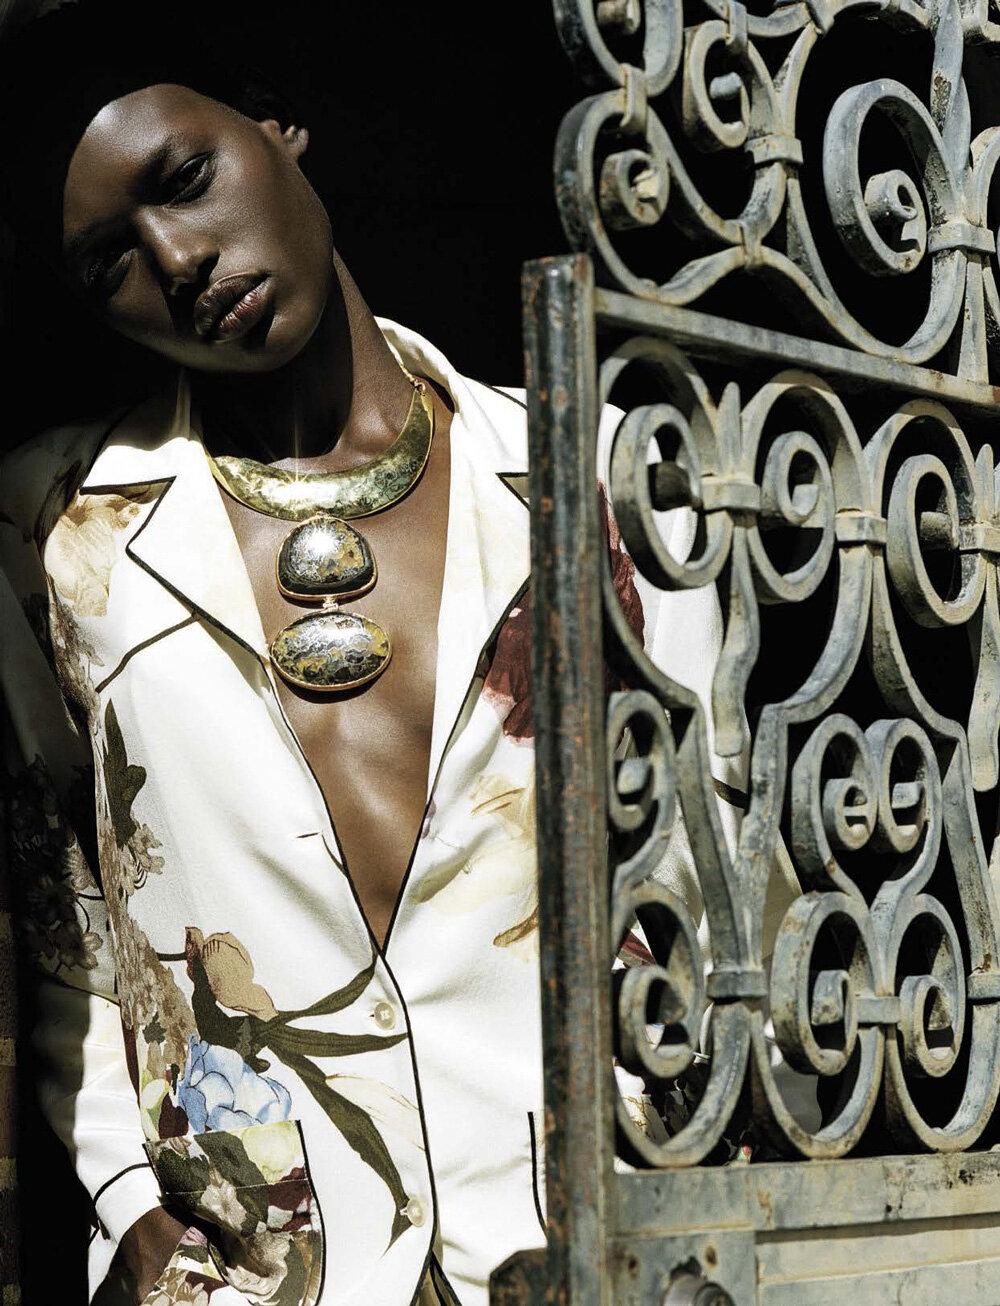 Vogue Italy, 2017